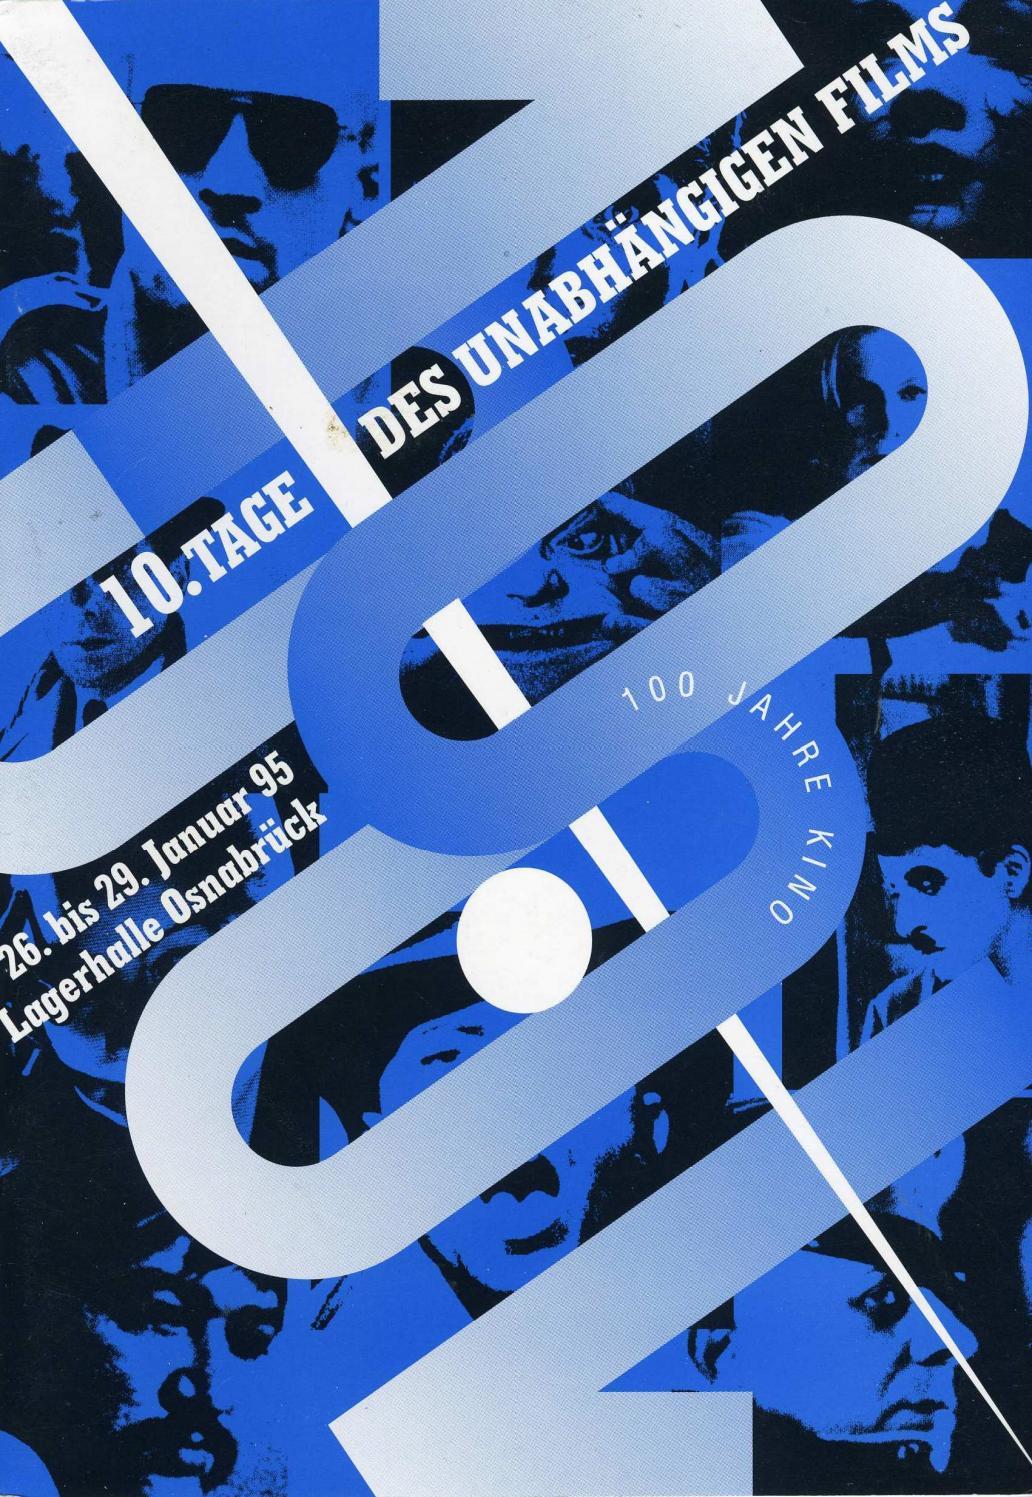 10 Tage Des Unabhängigen Films Programm 1995 By